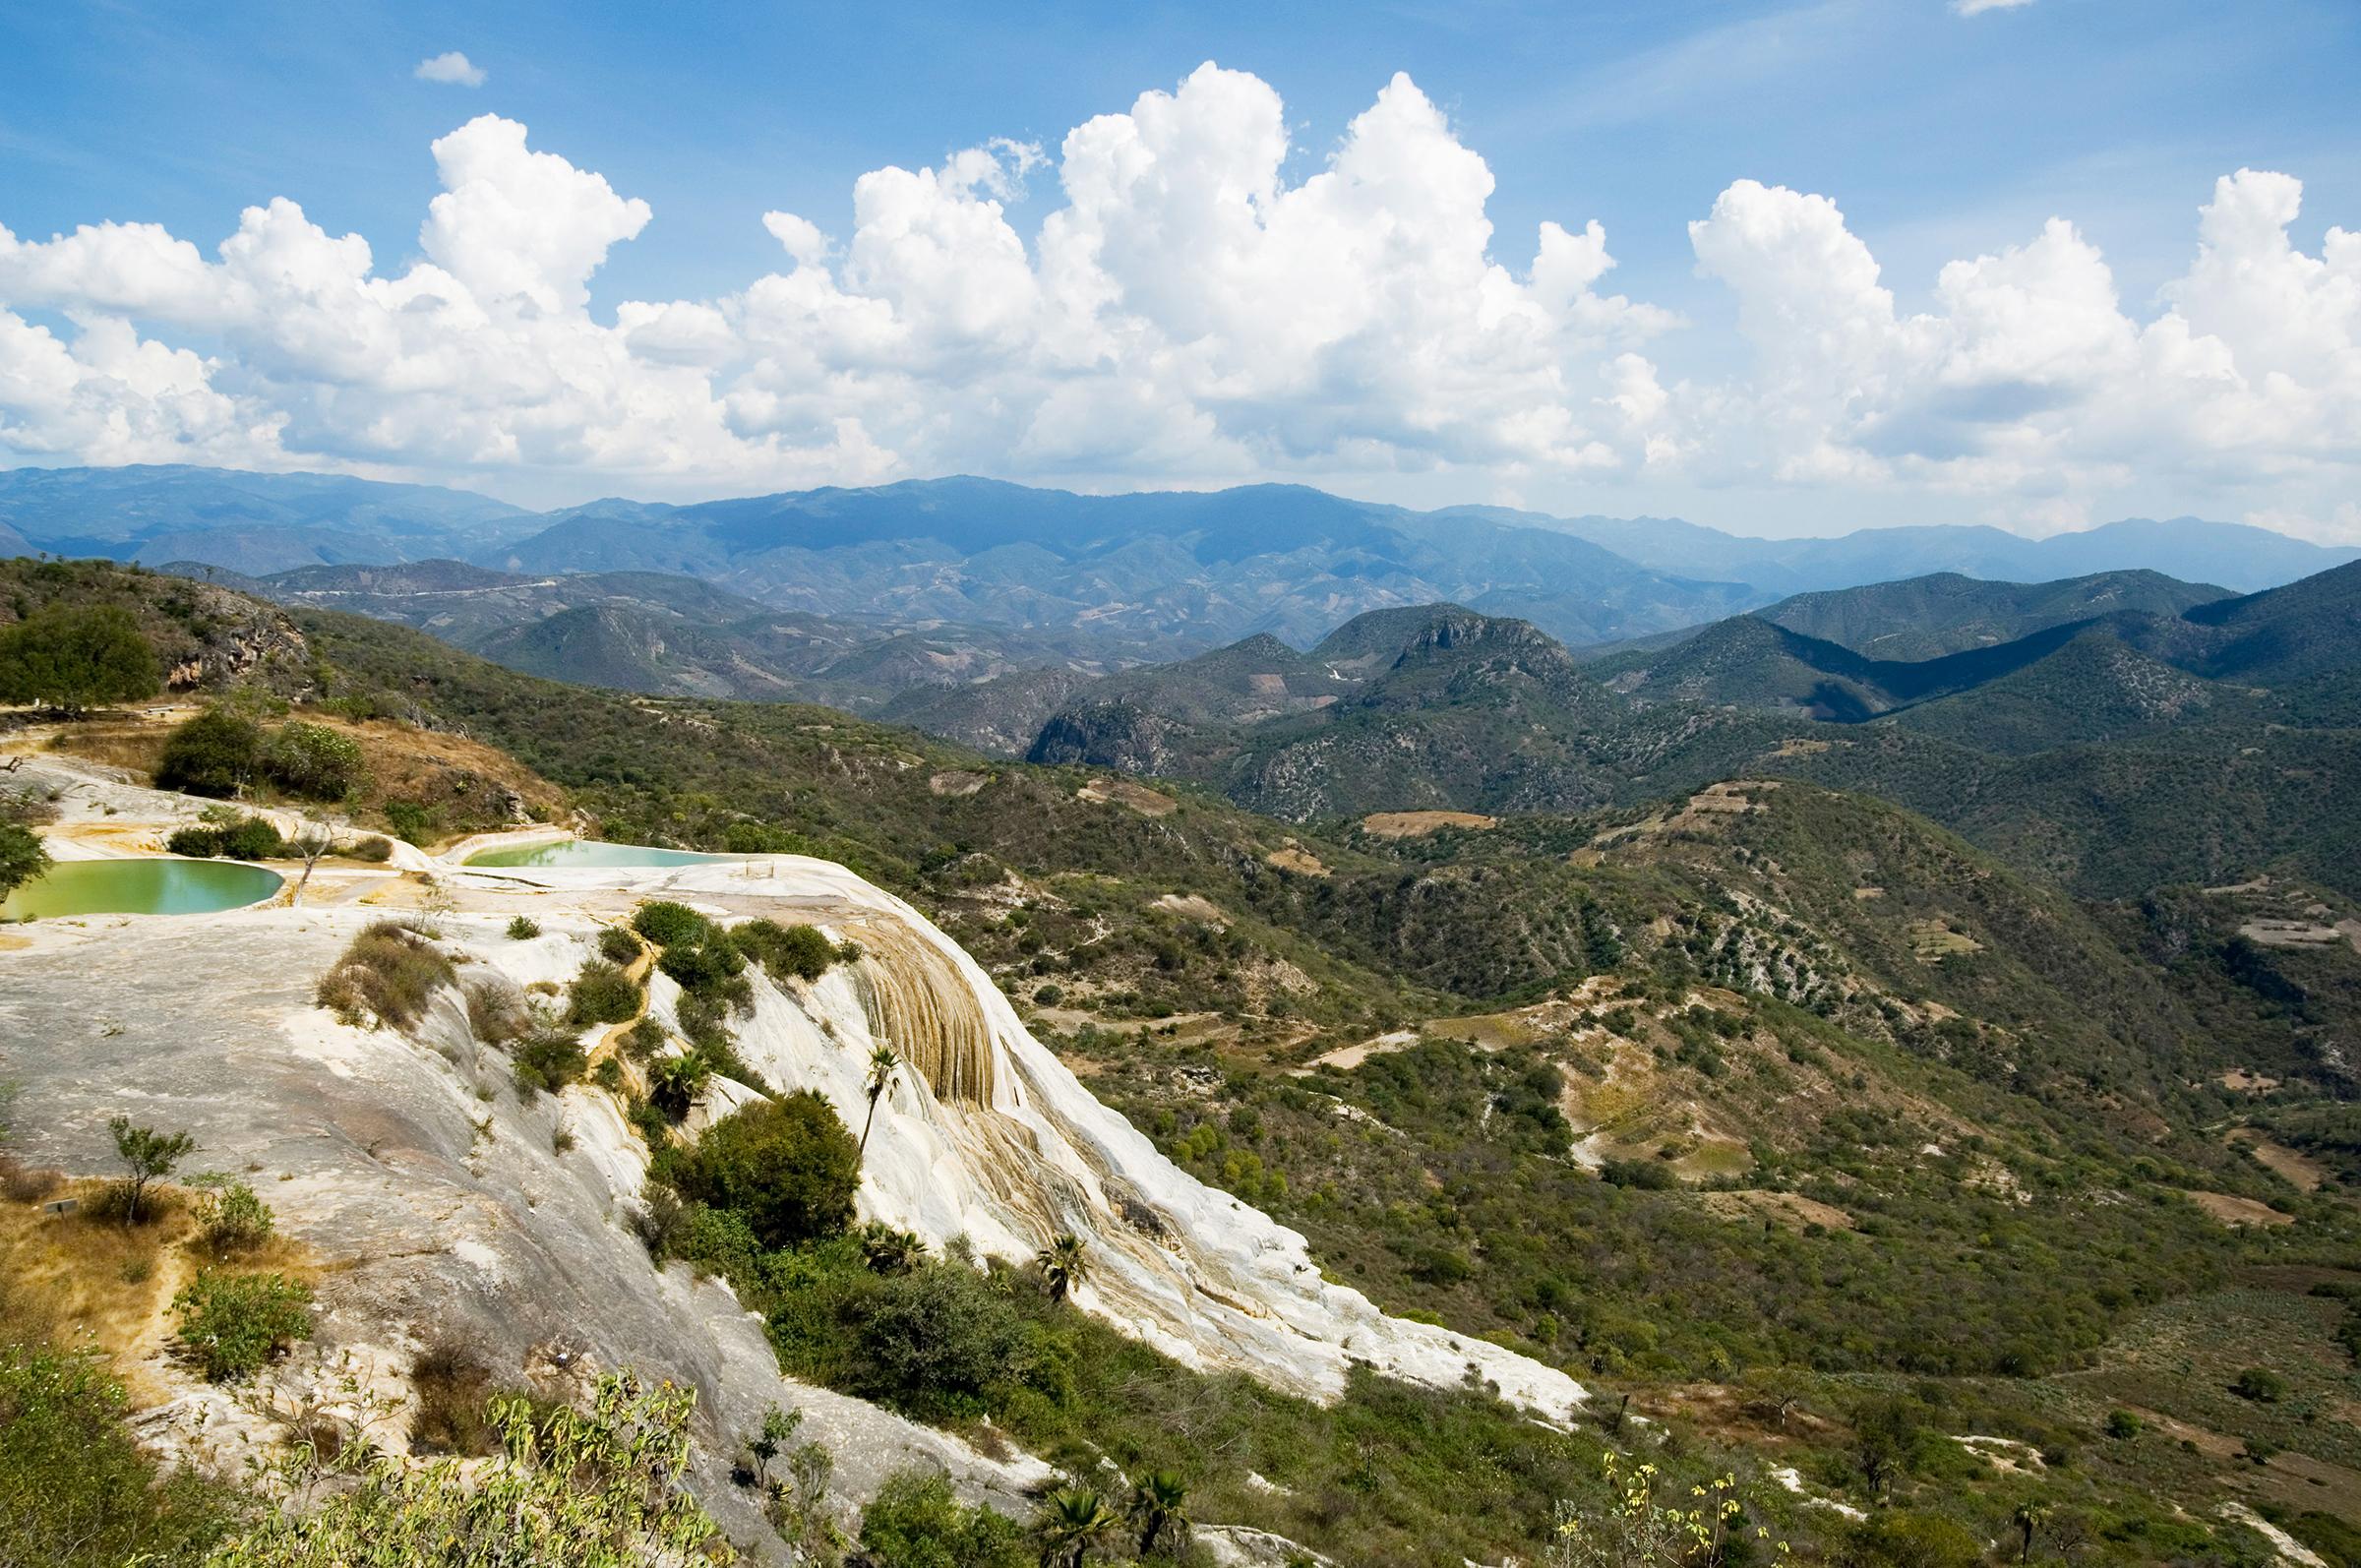 Nozze con panorami spettacolari in Messico